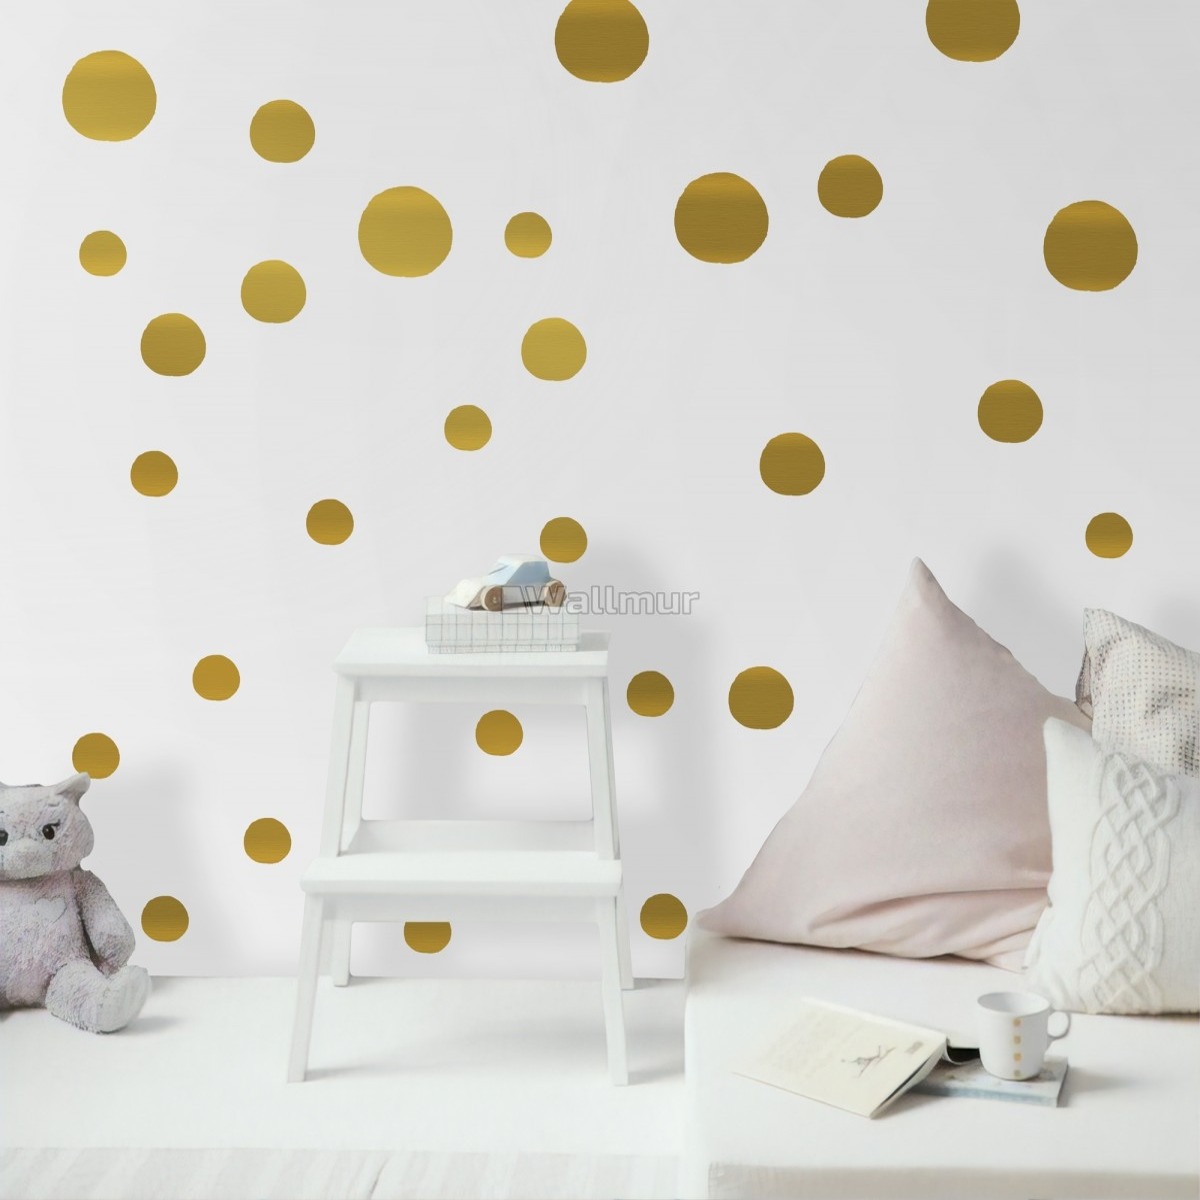 Gold Polka Dots Wall Decal Sticker